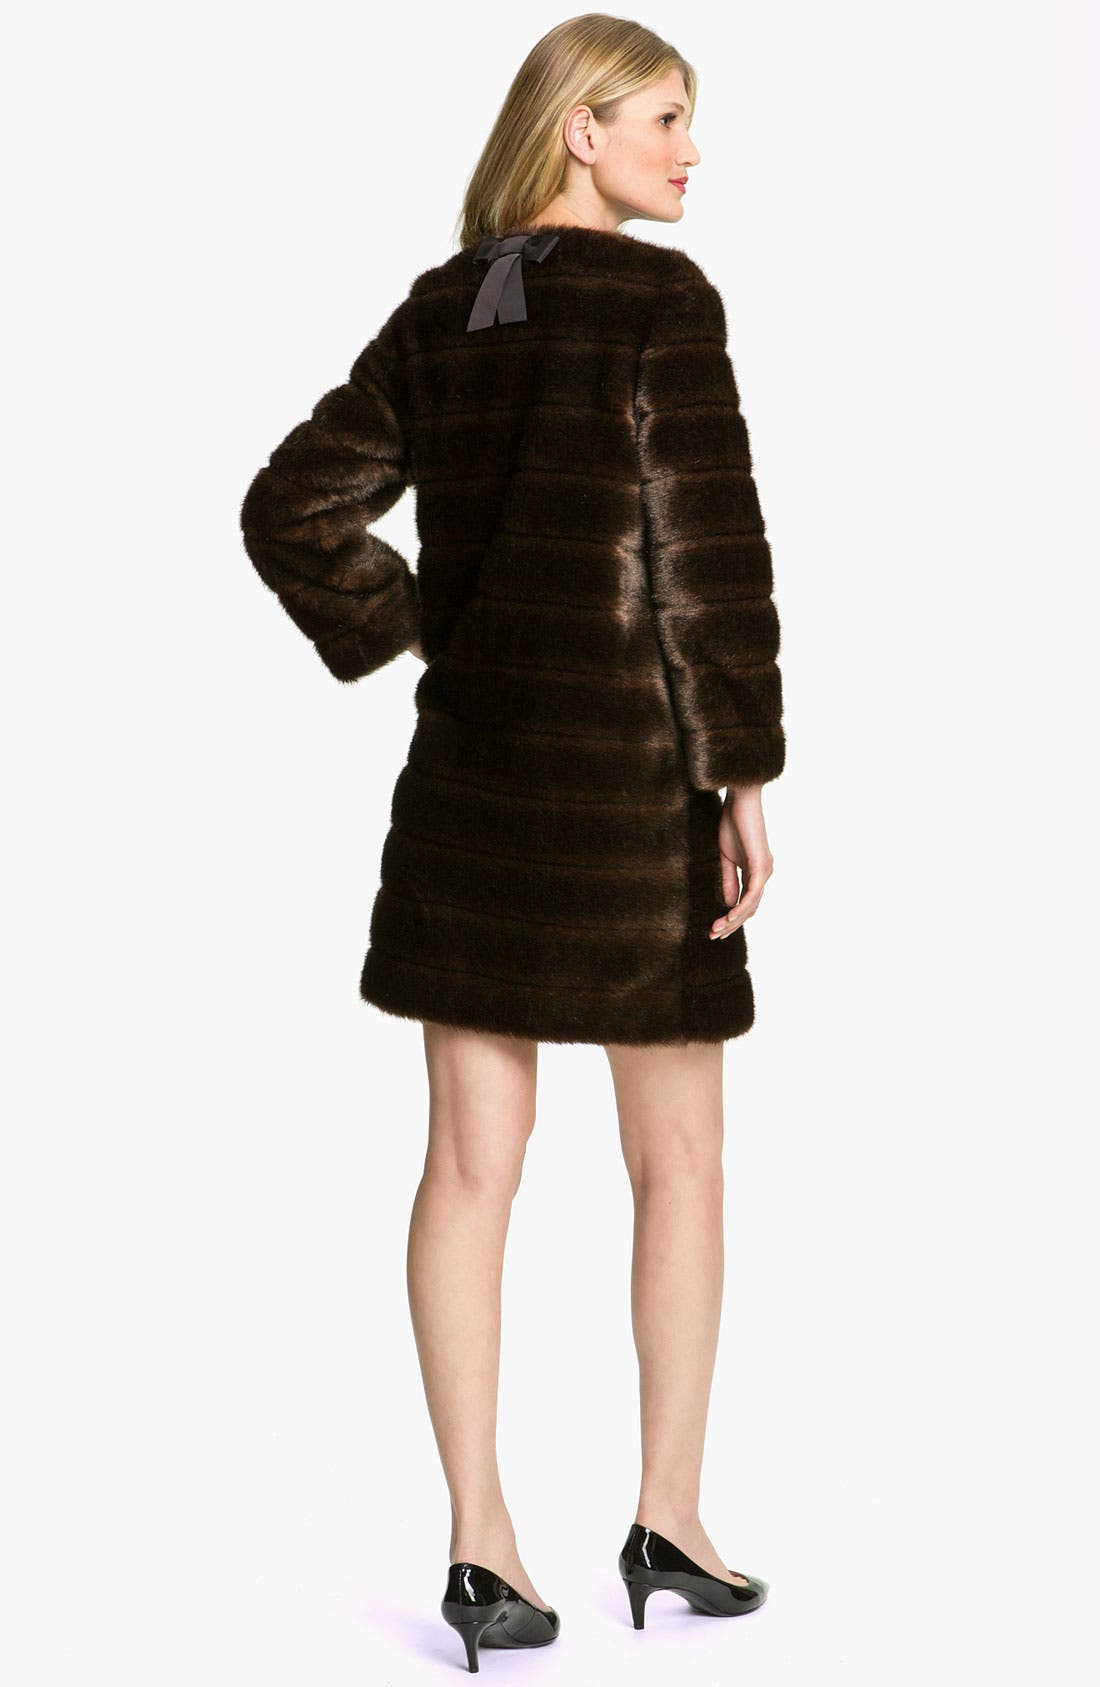 KATE SPADE NEW YORK,                             'vanessa' embellished dress,                             Main thumbnail 1, color,                             440